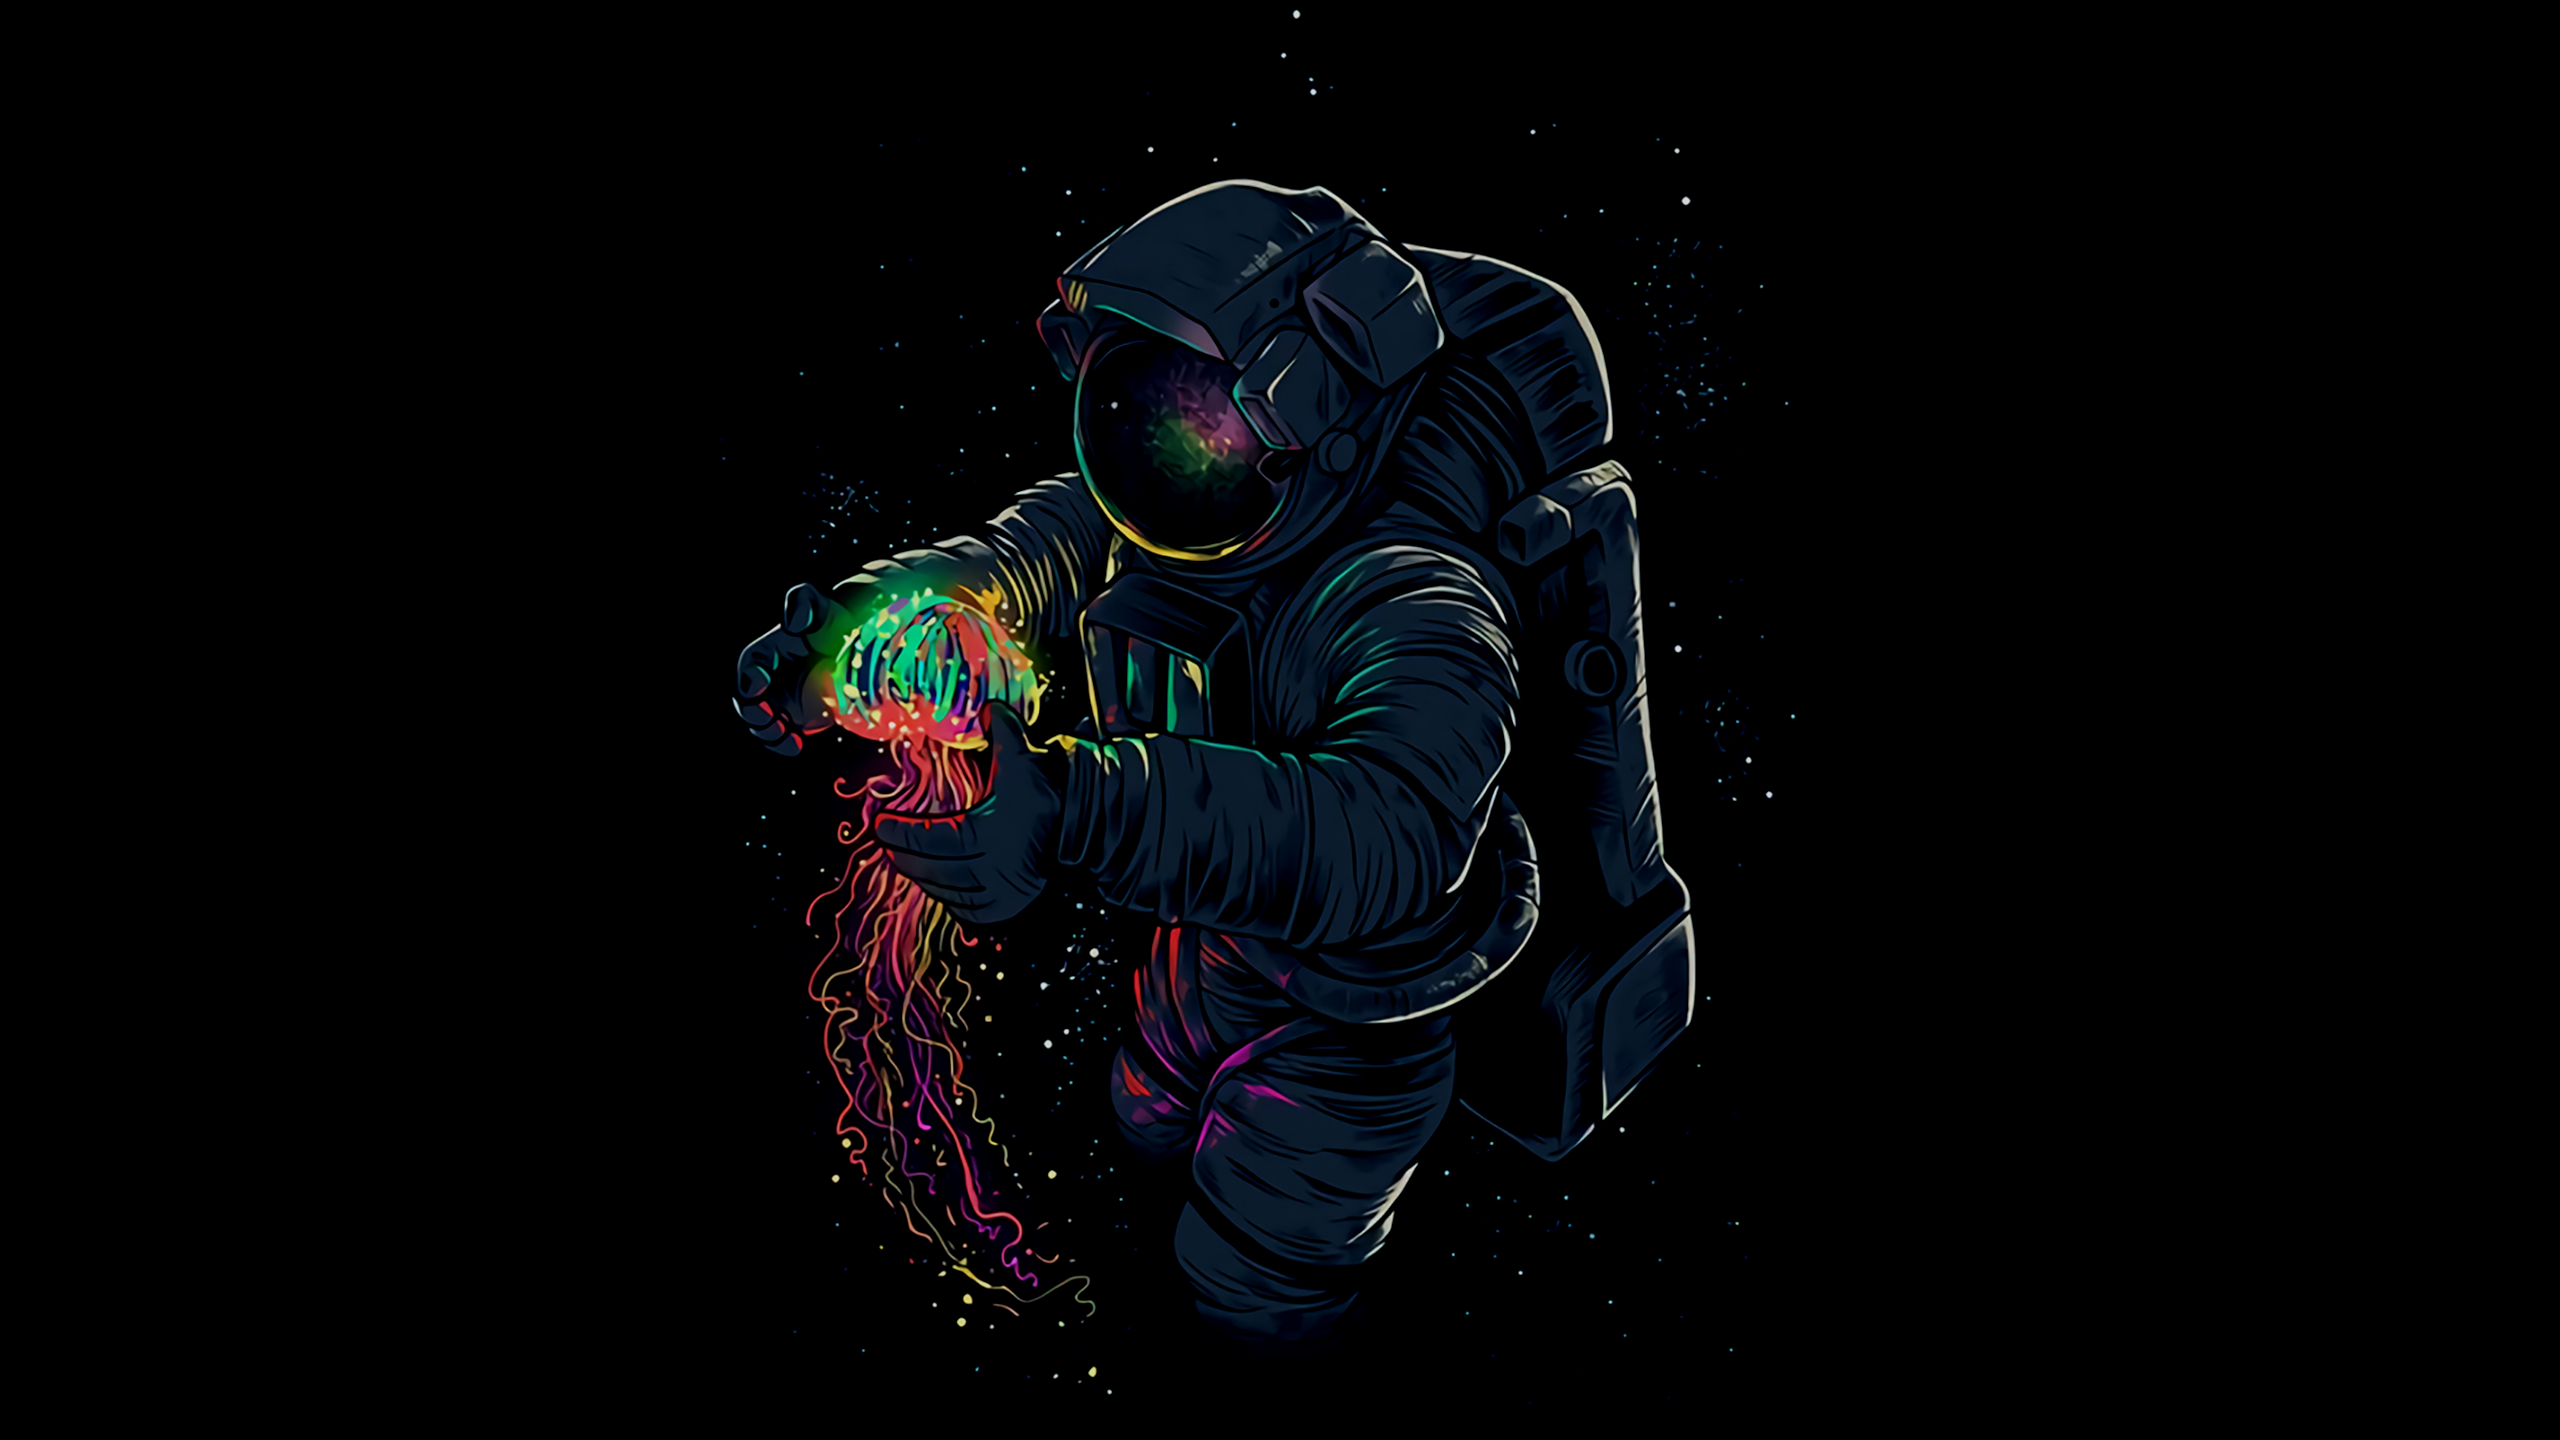 Cartoon Astronaut [2560 x 1440]